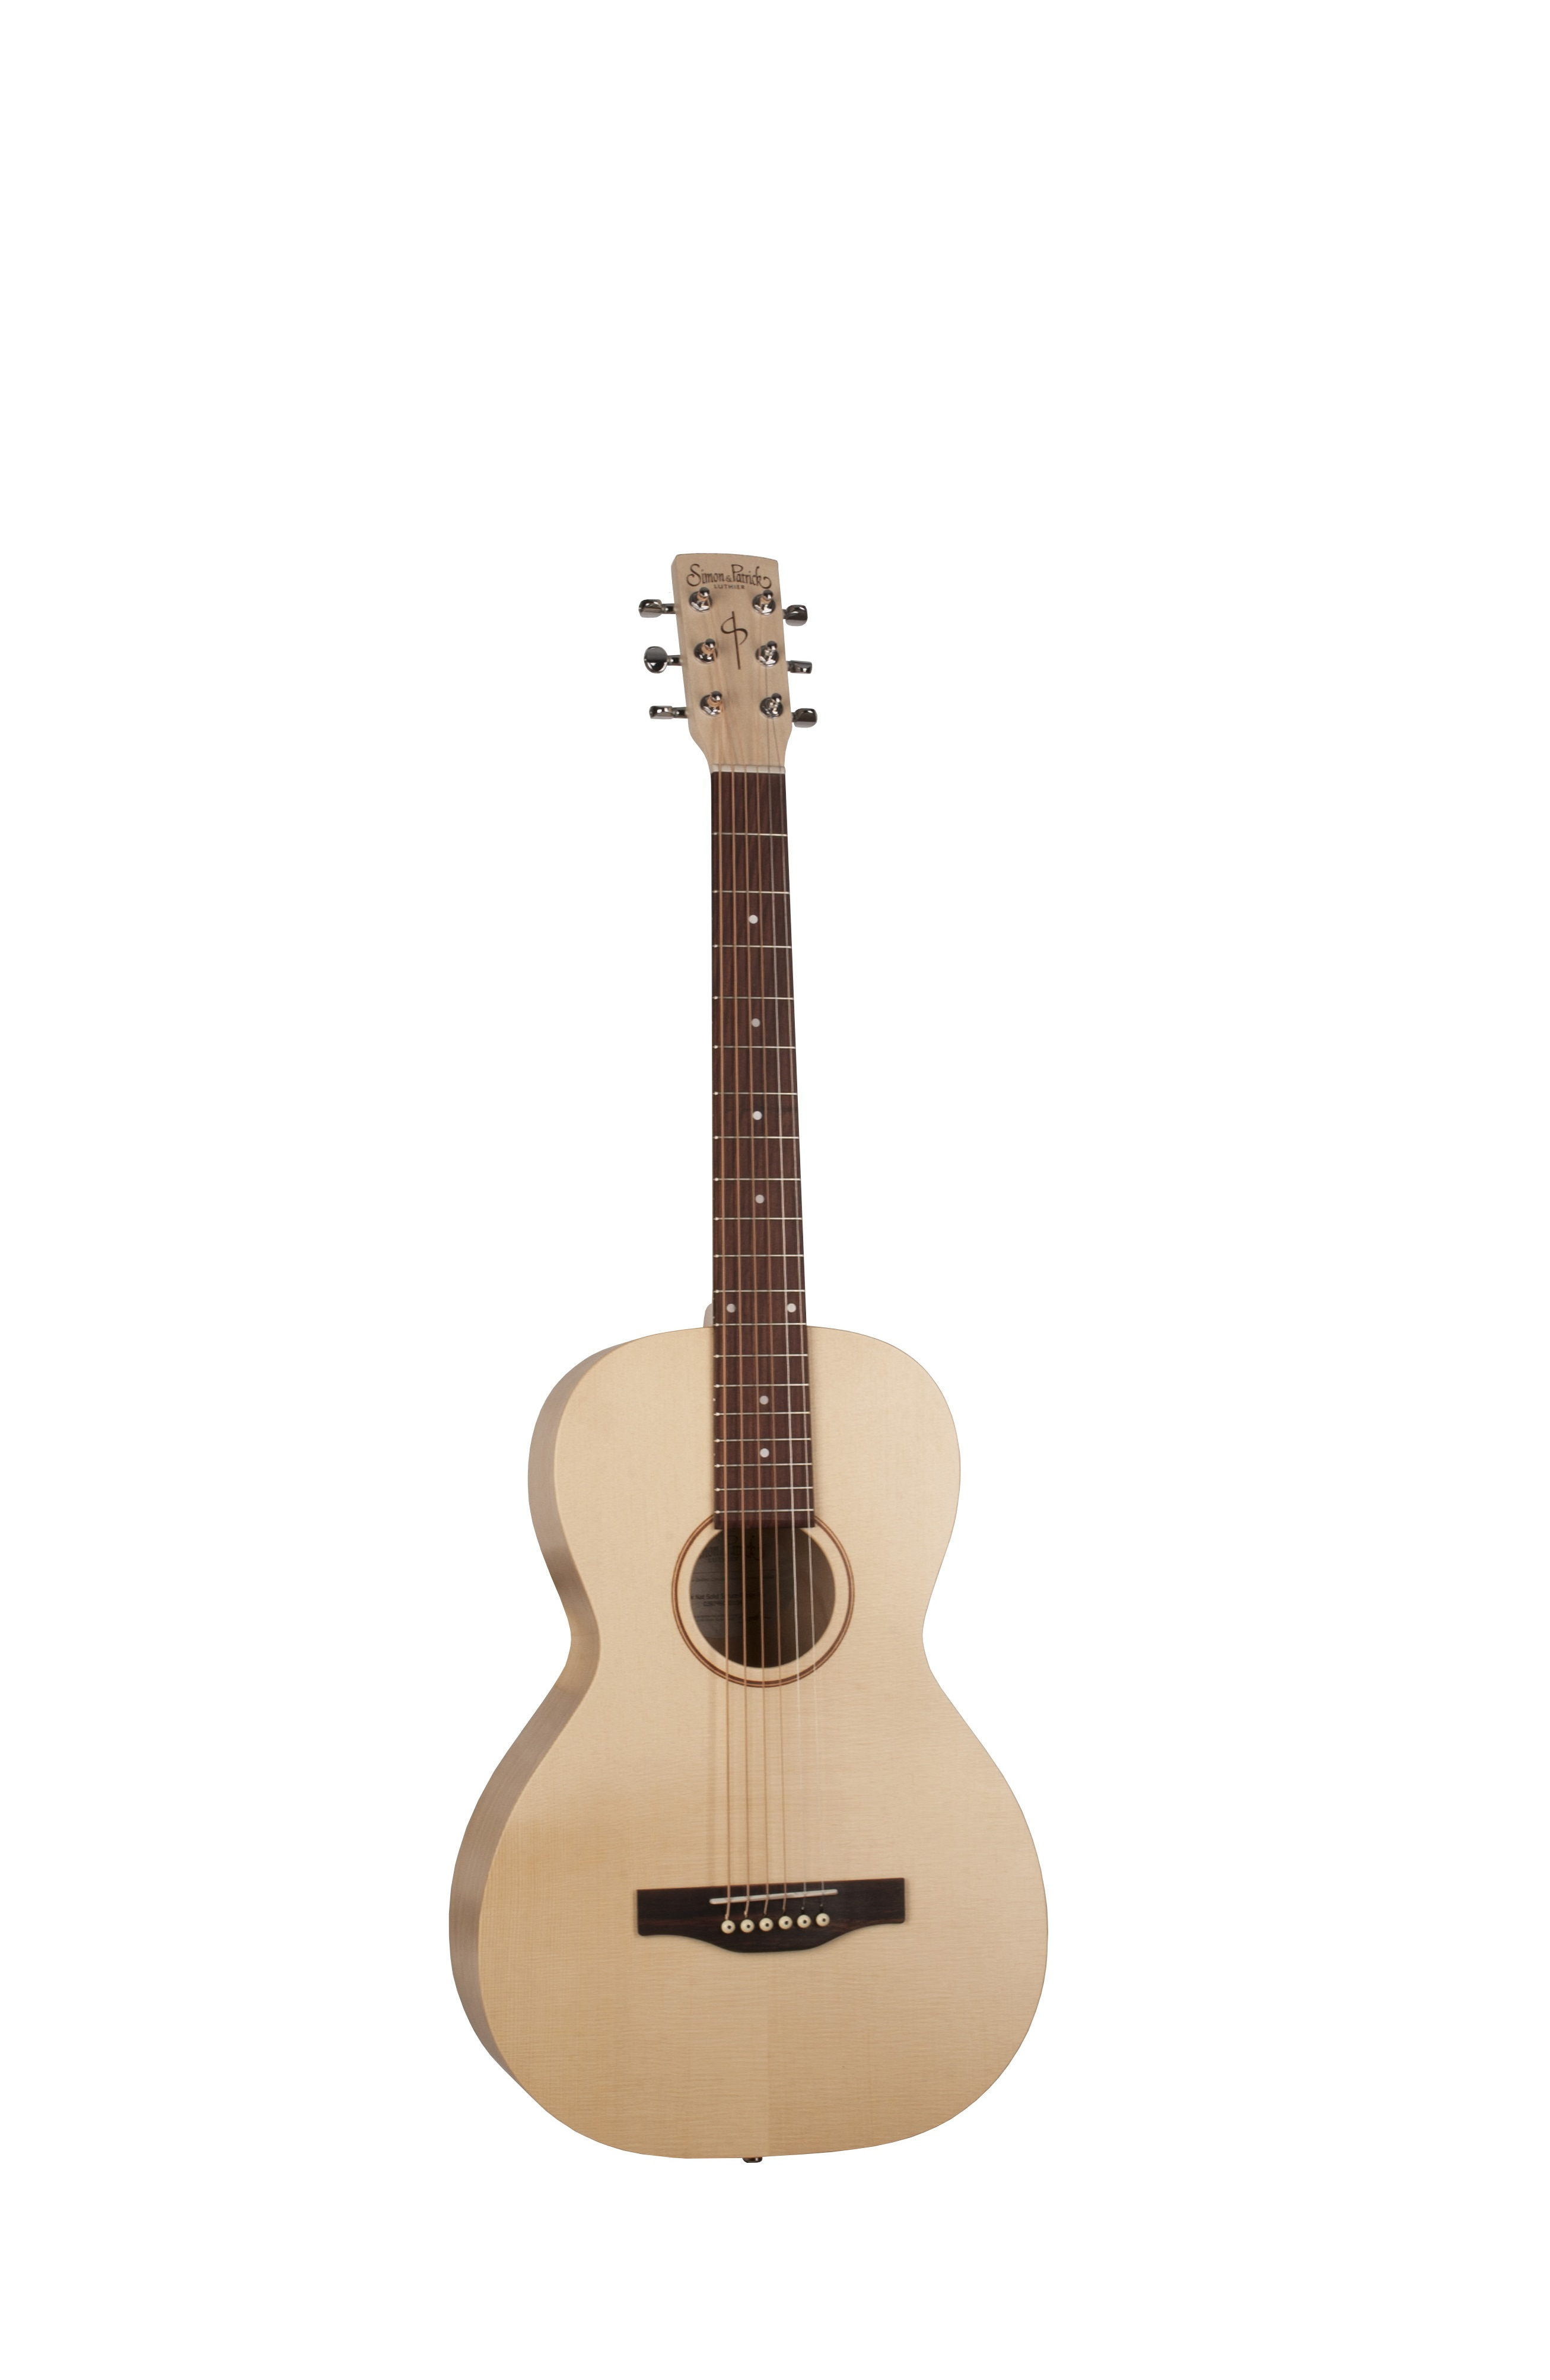 Simon & Patrick 39746 Trek Natural Spruce Parlor Acoustic Guitar